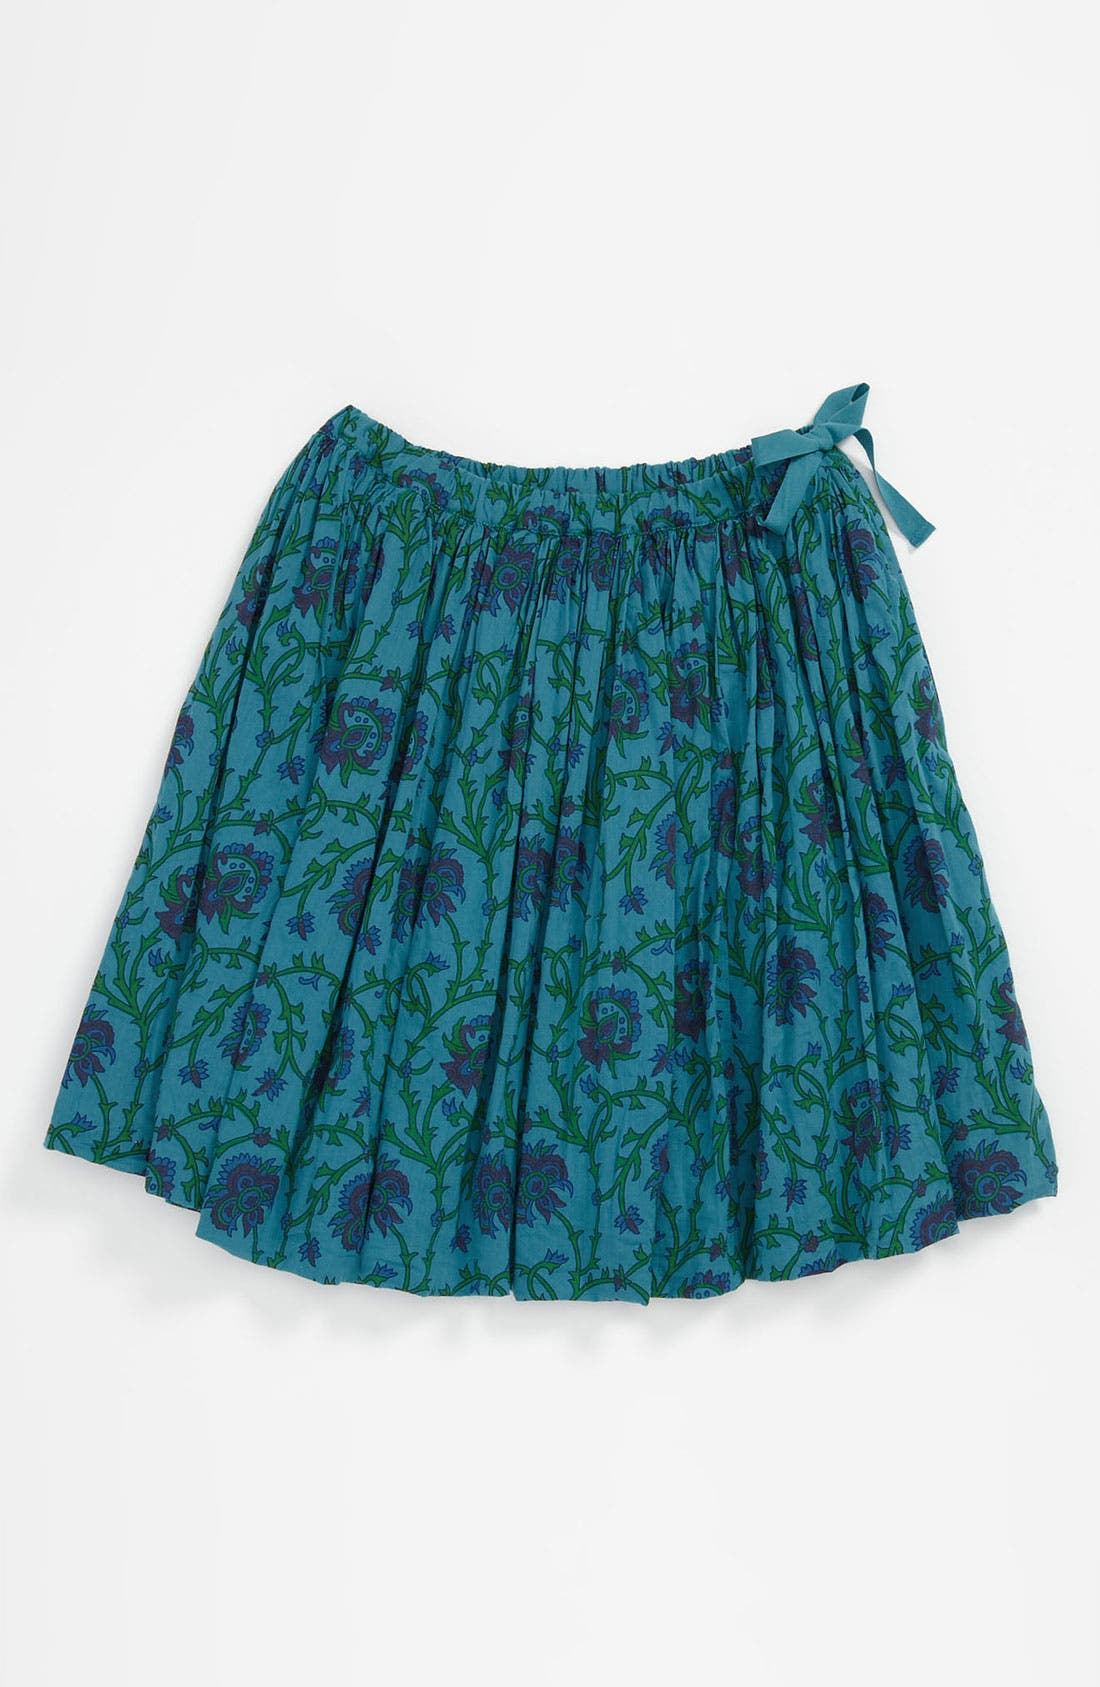 Main Image - Peek 'Eve' Skirt (Toddler, Little Girls & Big Girls)